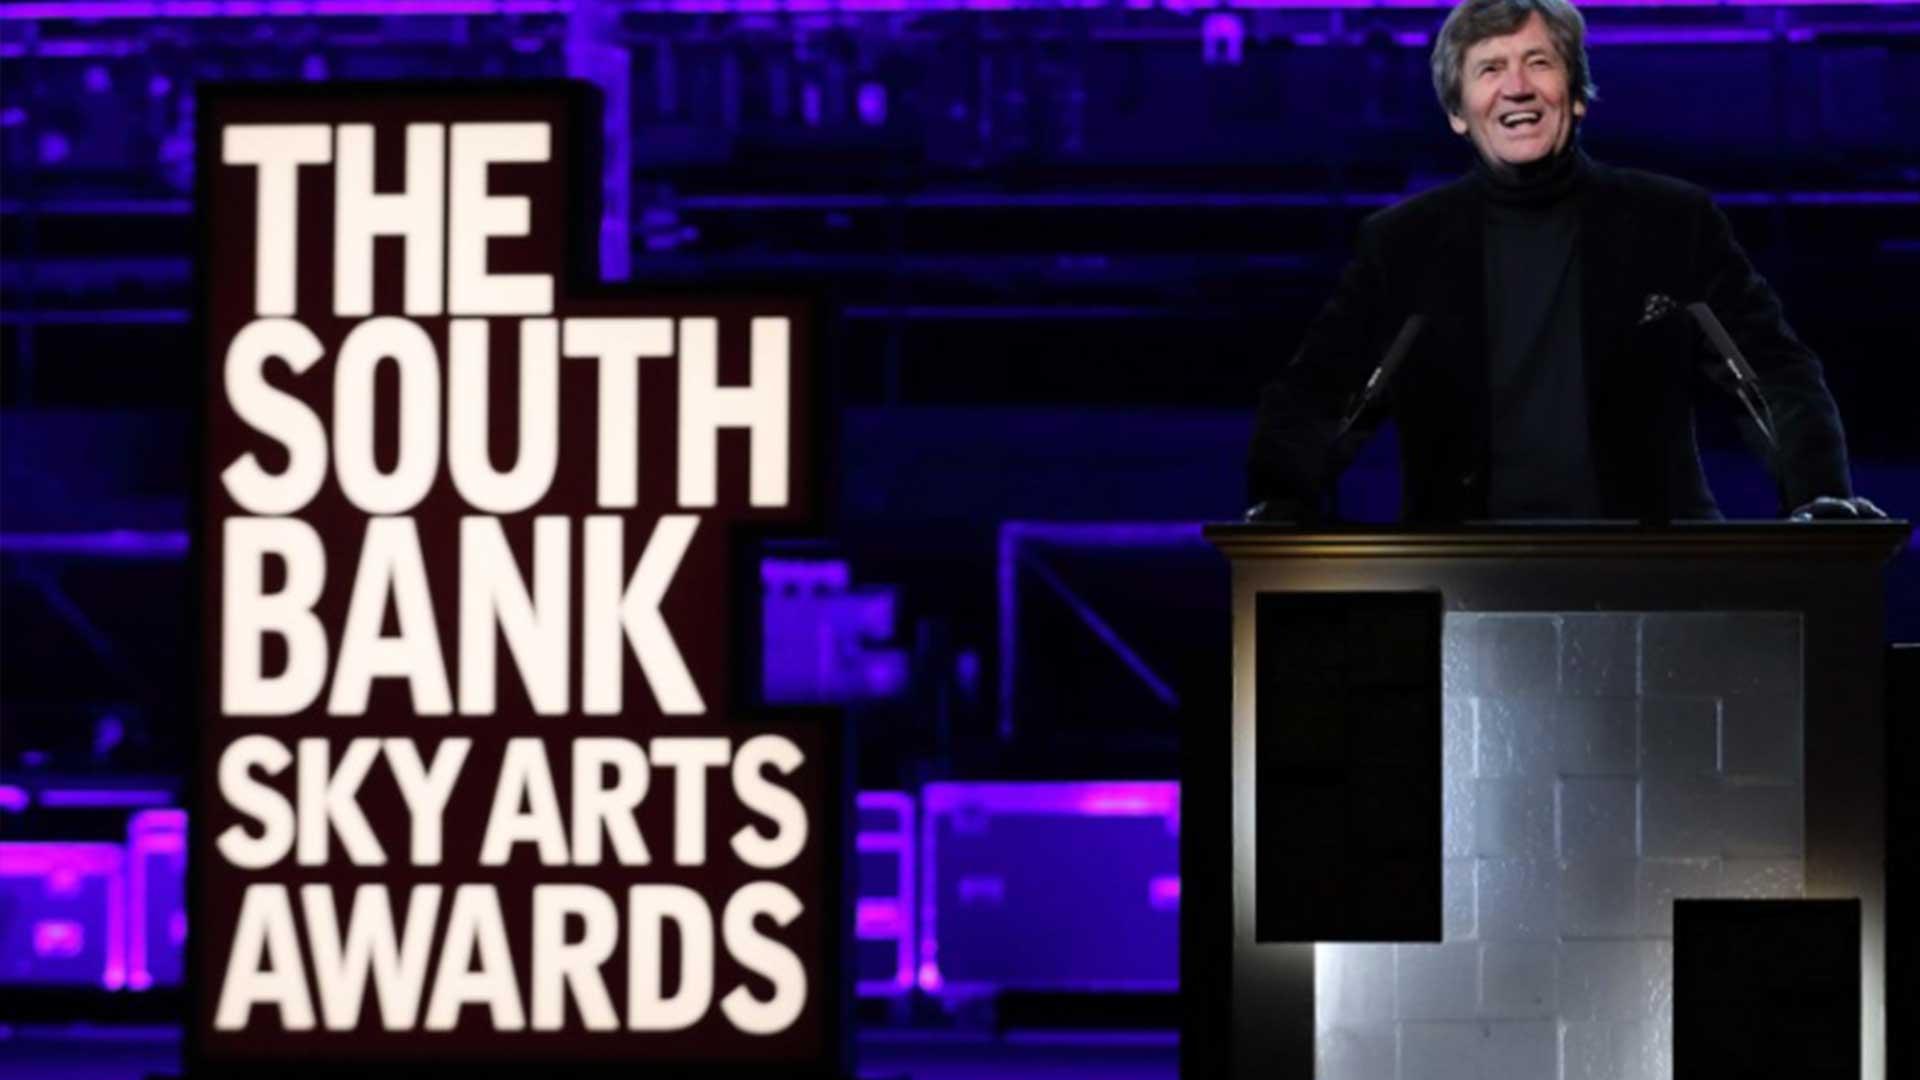 South Bank Sky Arts Awards 2020